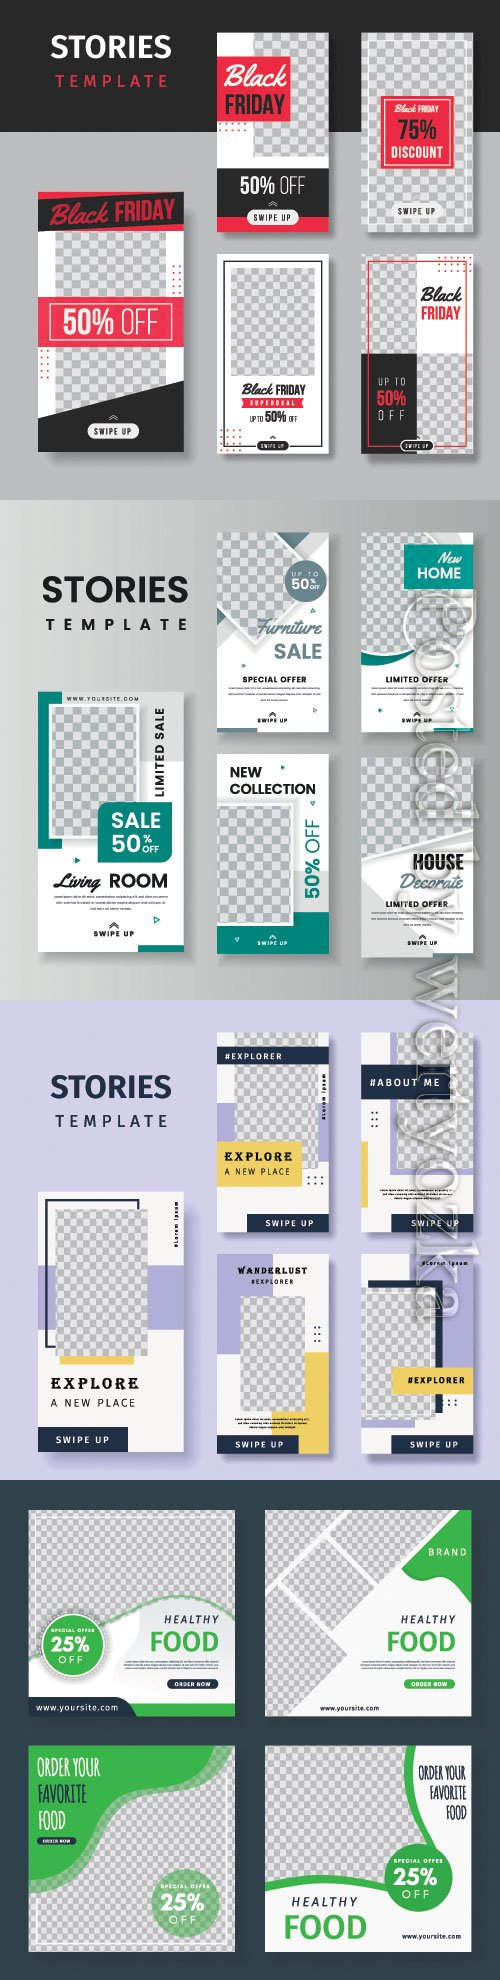 Social media stories vector template